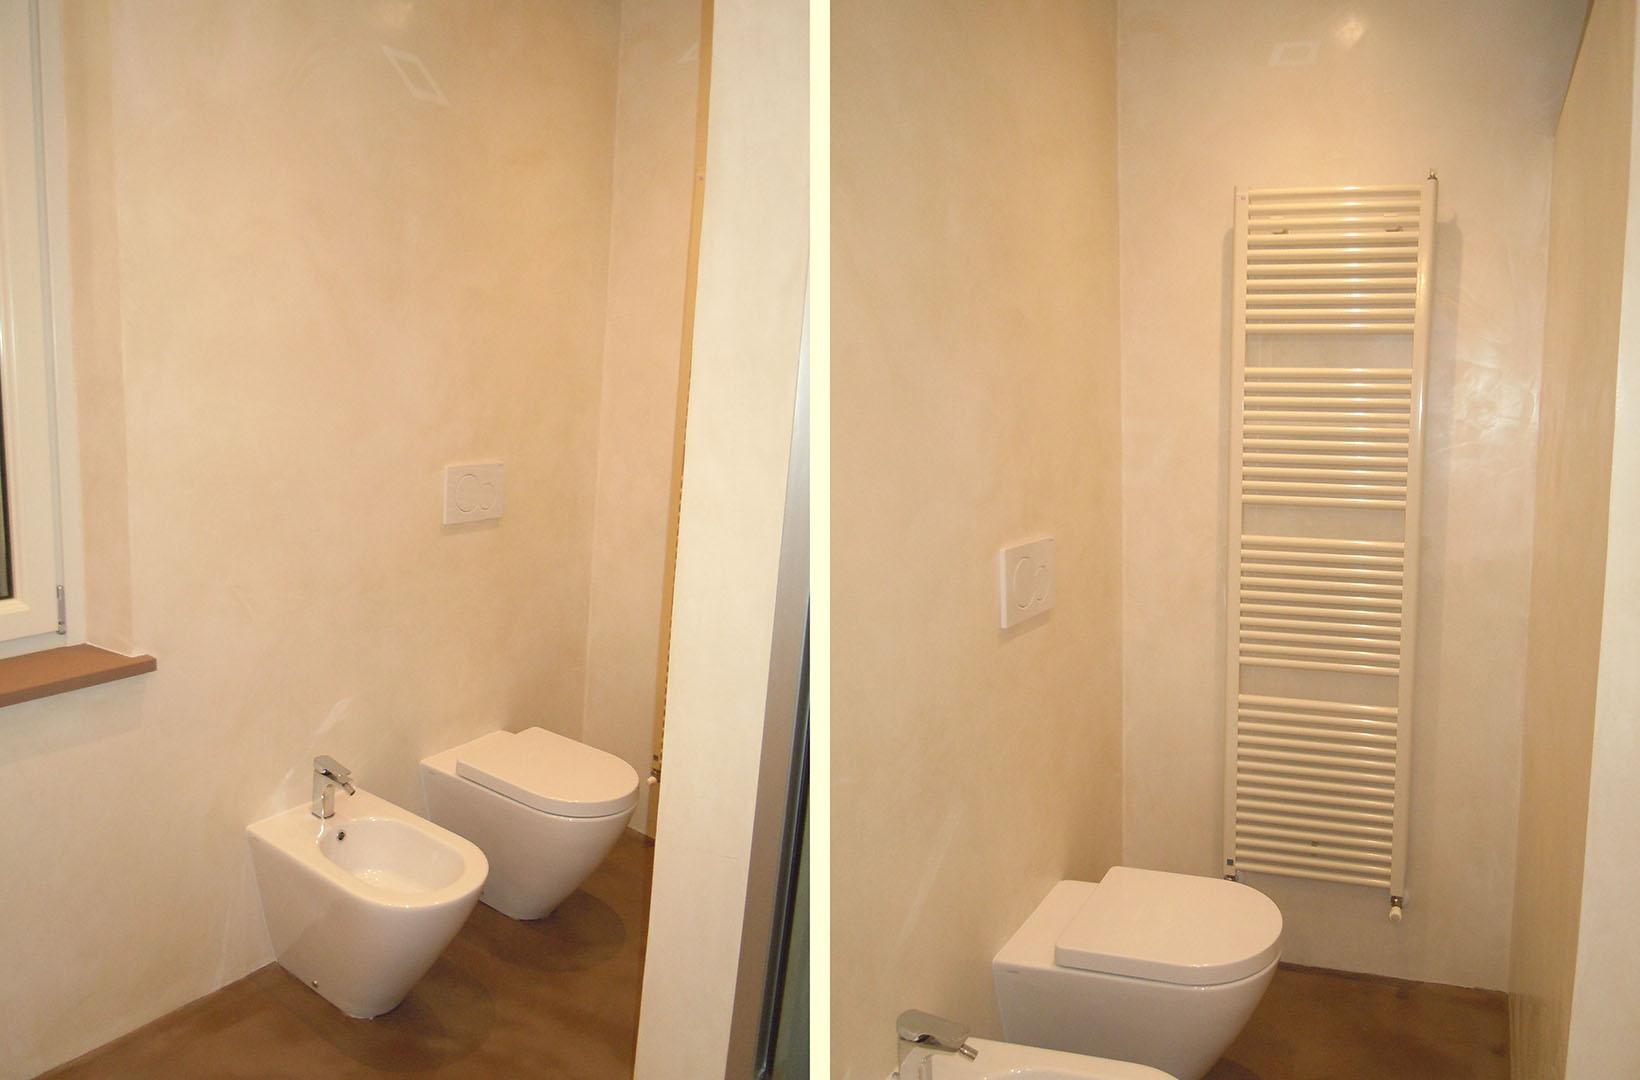 Bagno padronale bagno turco in microcemento emsign - Microcemento bagno ...